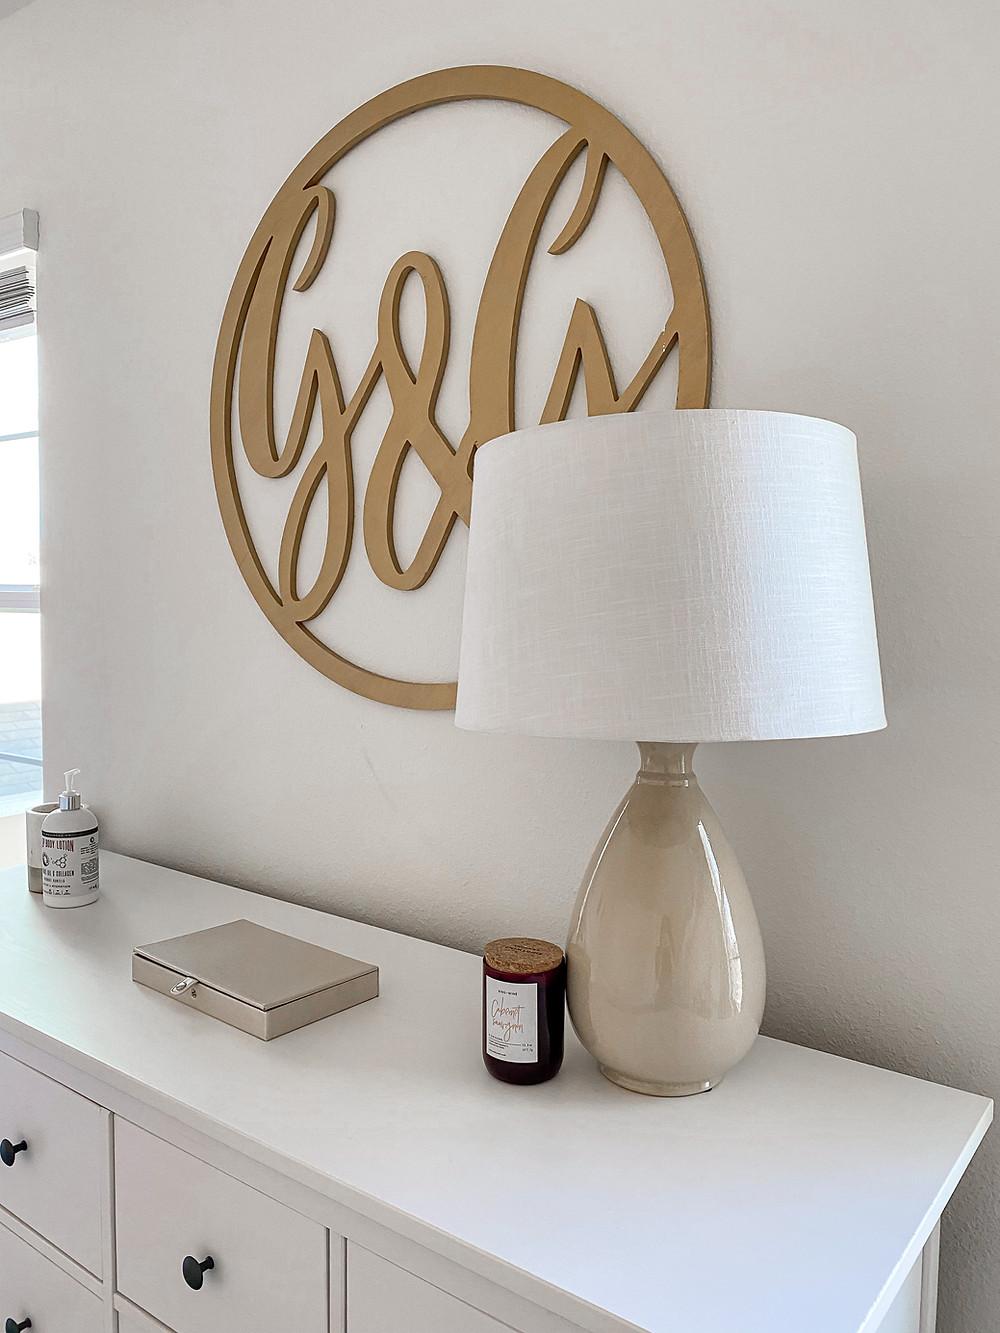 minimalist table lamp and signatura monogram wall art